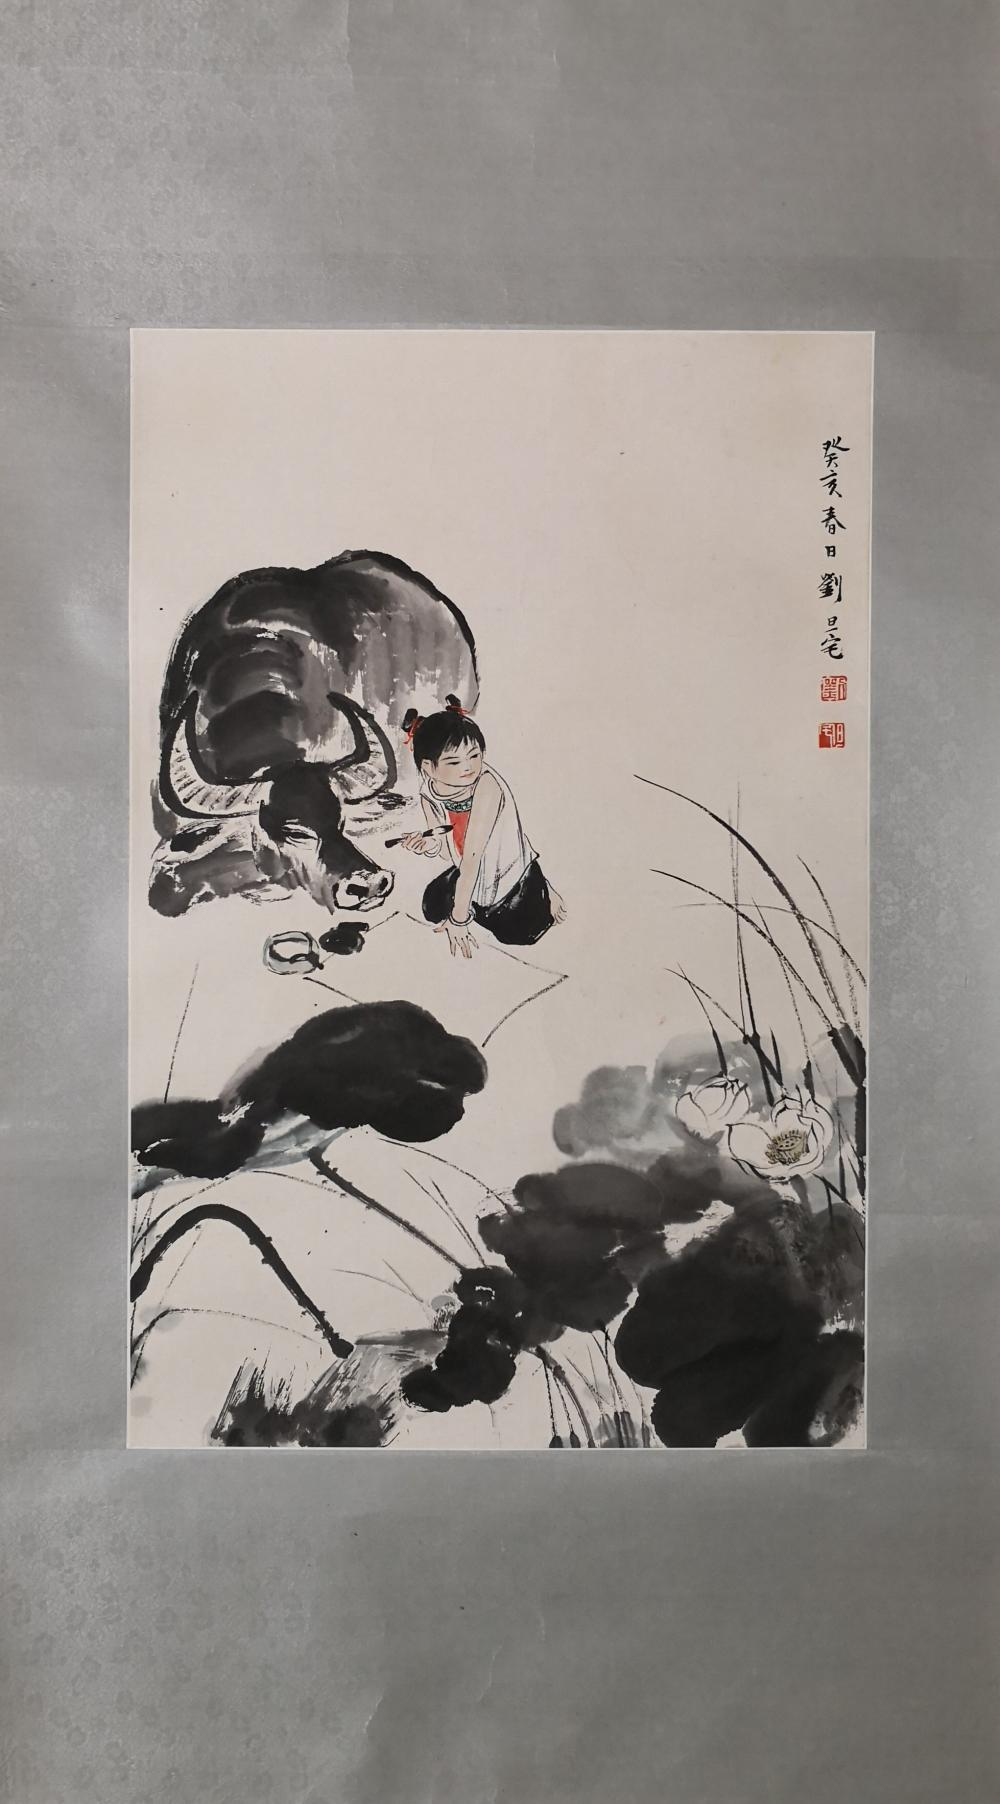 A CHINESE PAINTING BY LIU DANZHAI